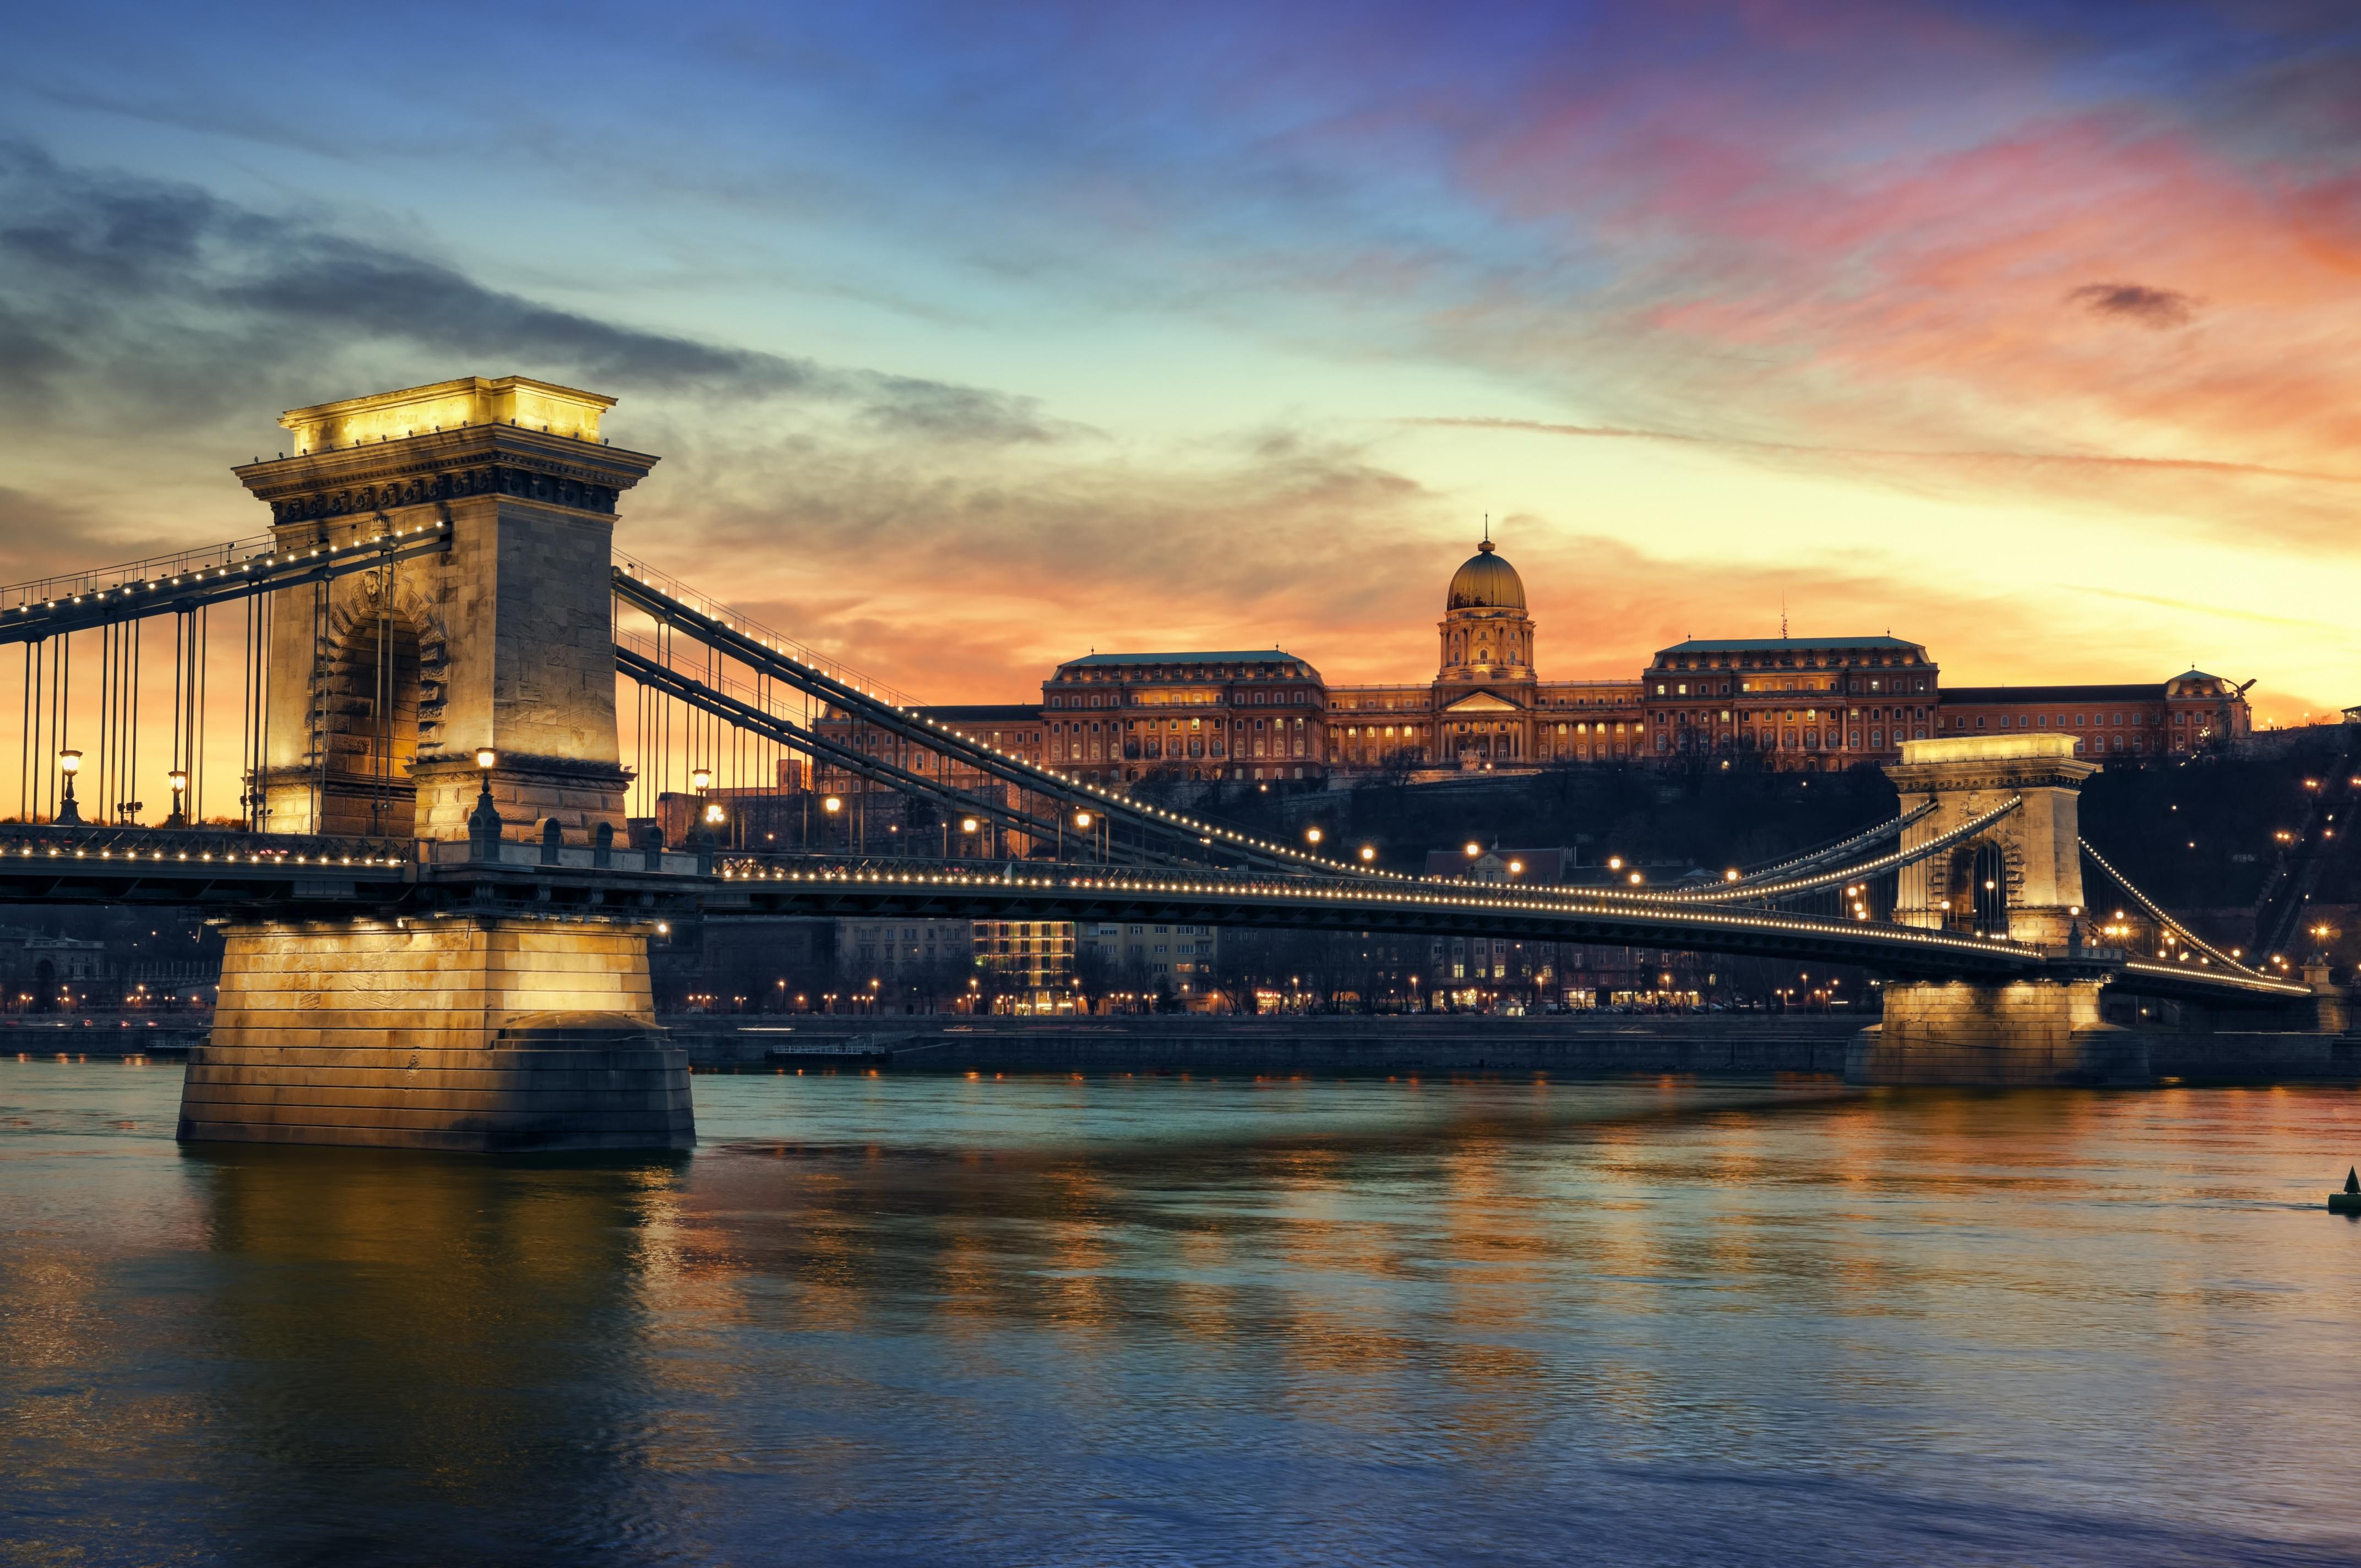 10 Billiga Weekenddestinationer Inom Europa Skyscanner Sverige